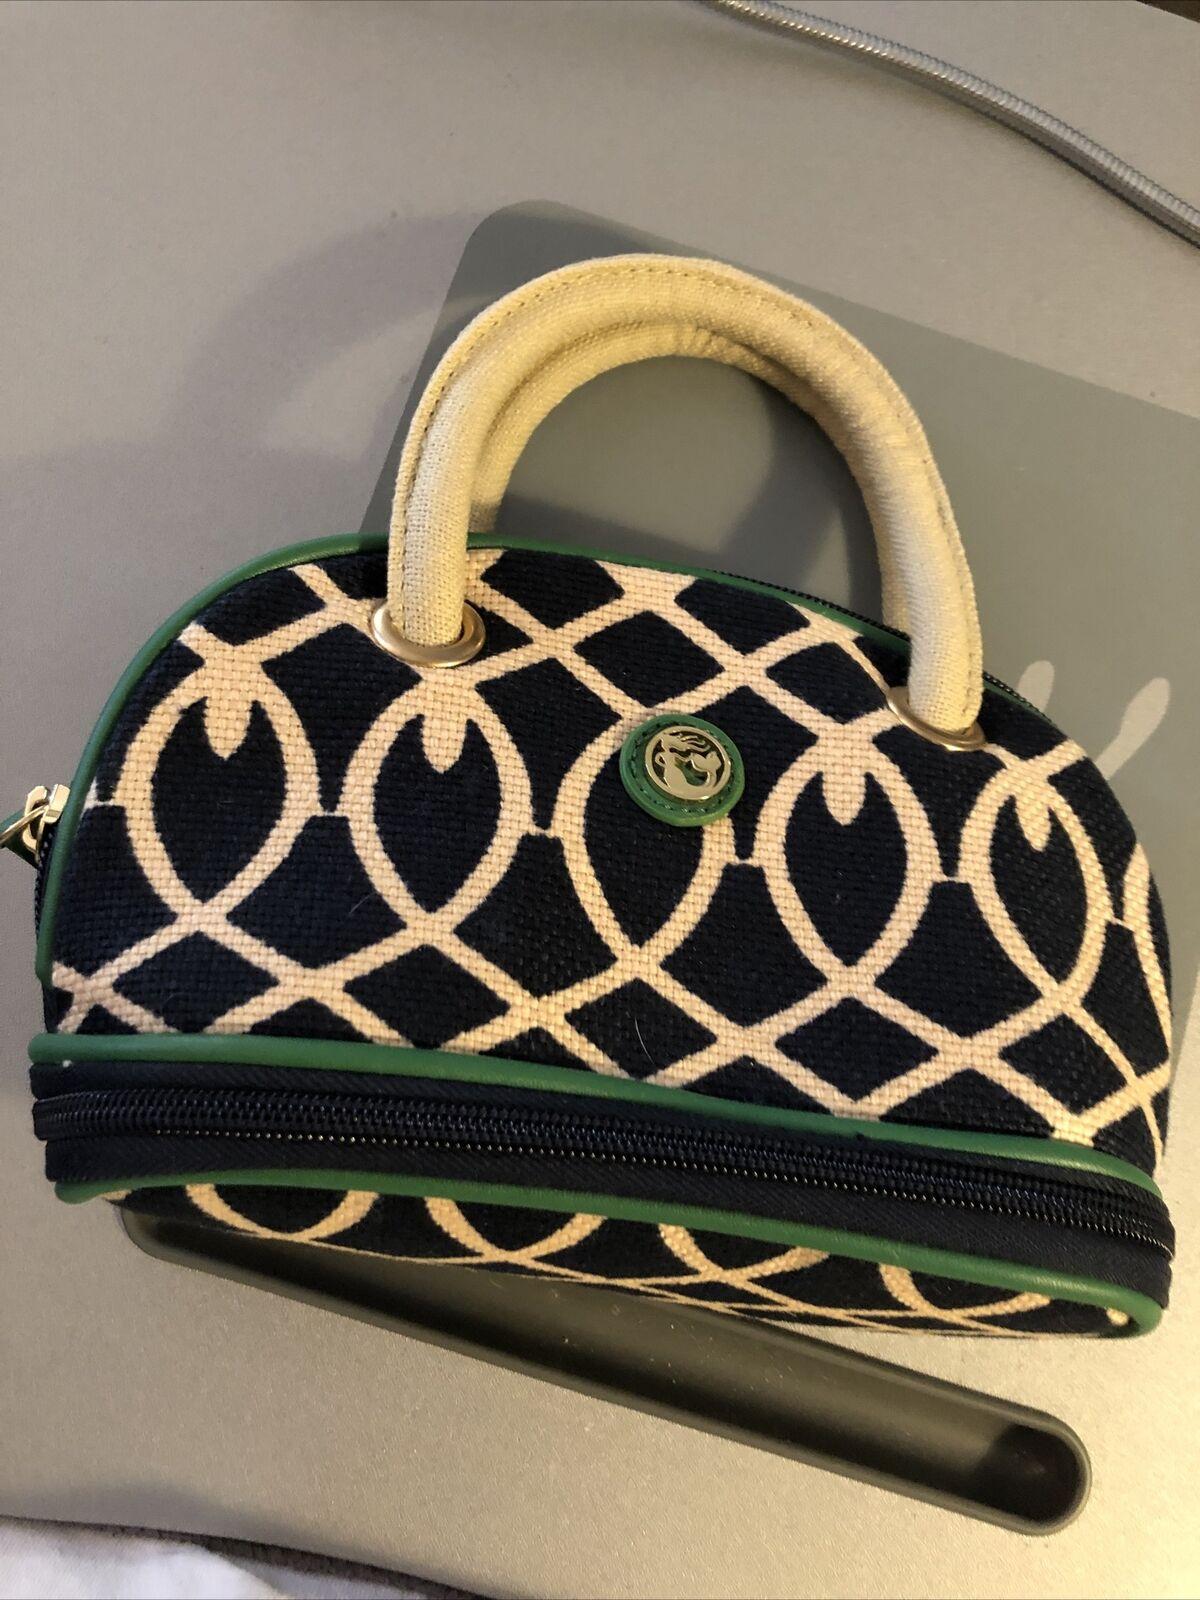 Spartina Mini Satchel Cosmetic Bag Linen Leather Makeup Case Navy Green Lattice